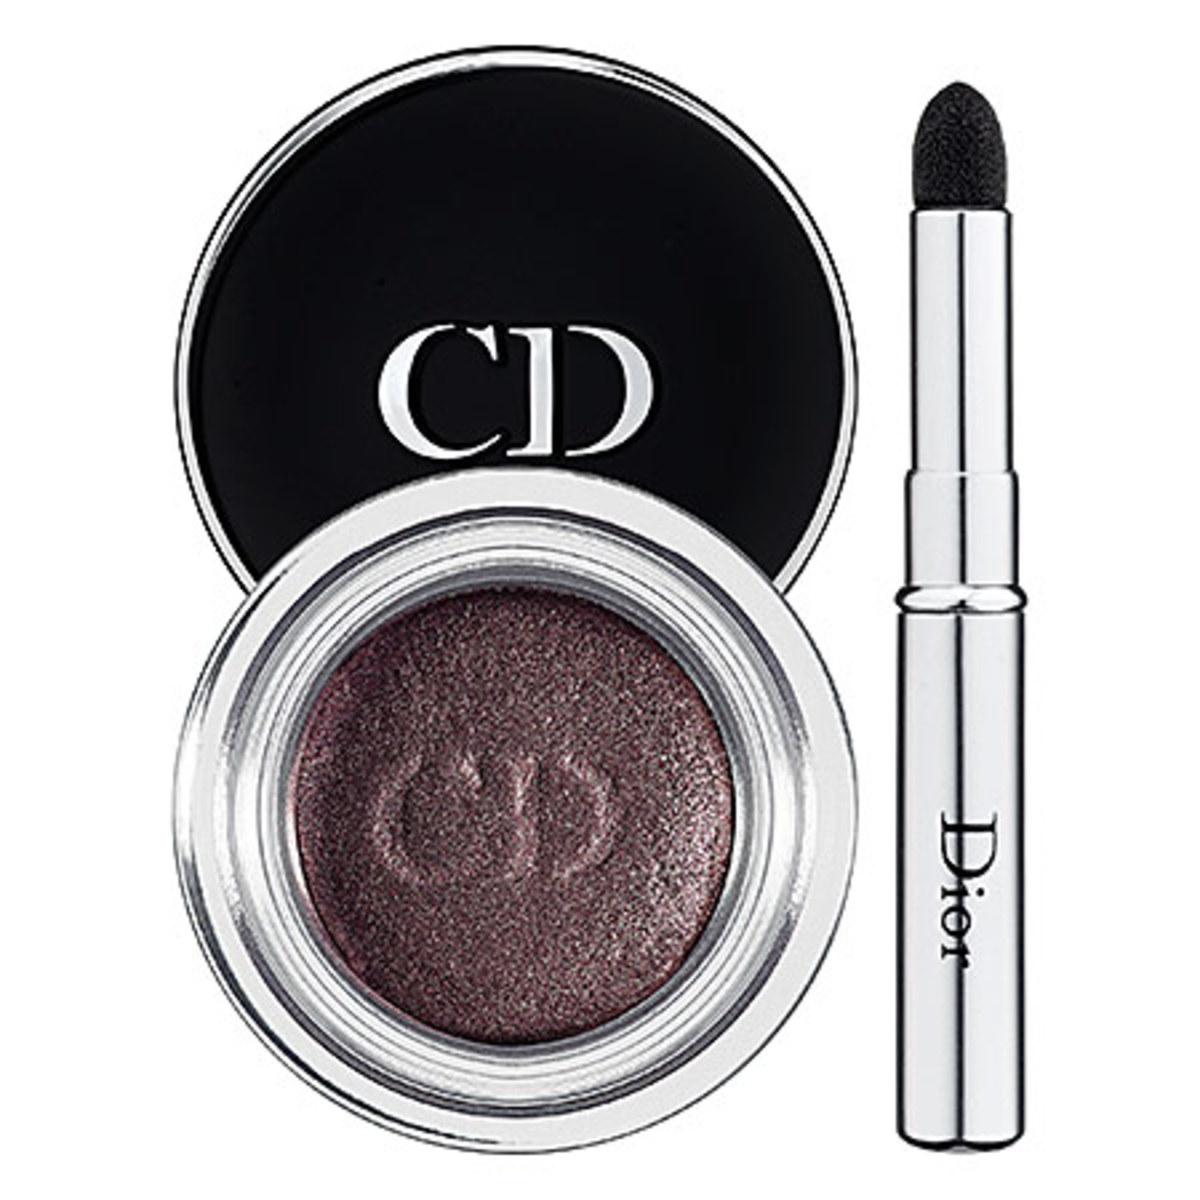 Dior DiorShow Fusion Mono Long-Wear Professional Mirror-Shine Eyeshadow in Hypnotique